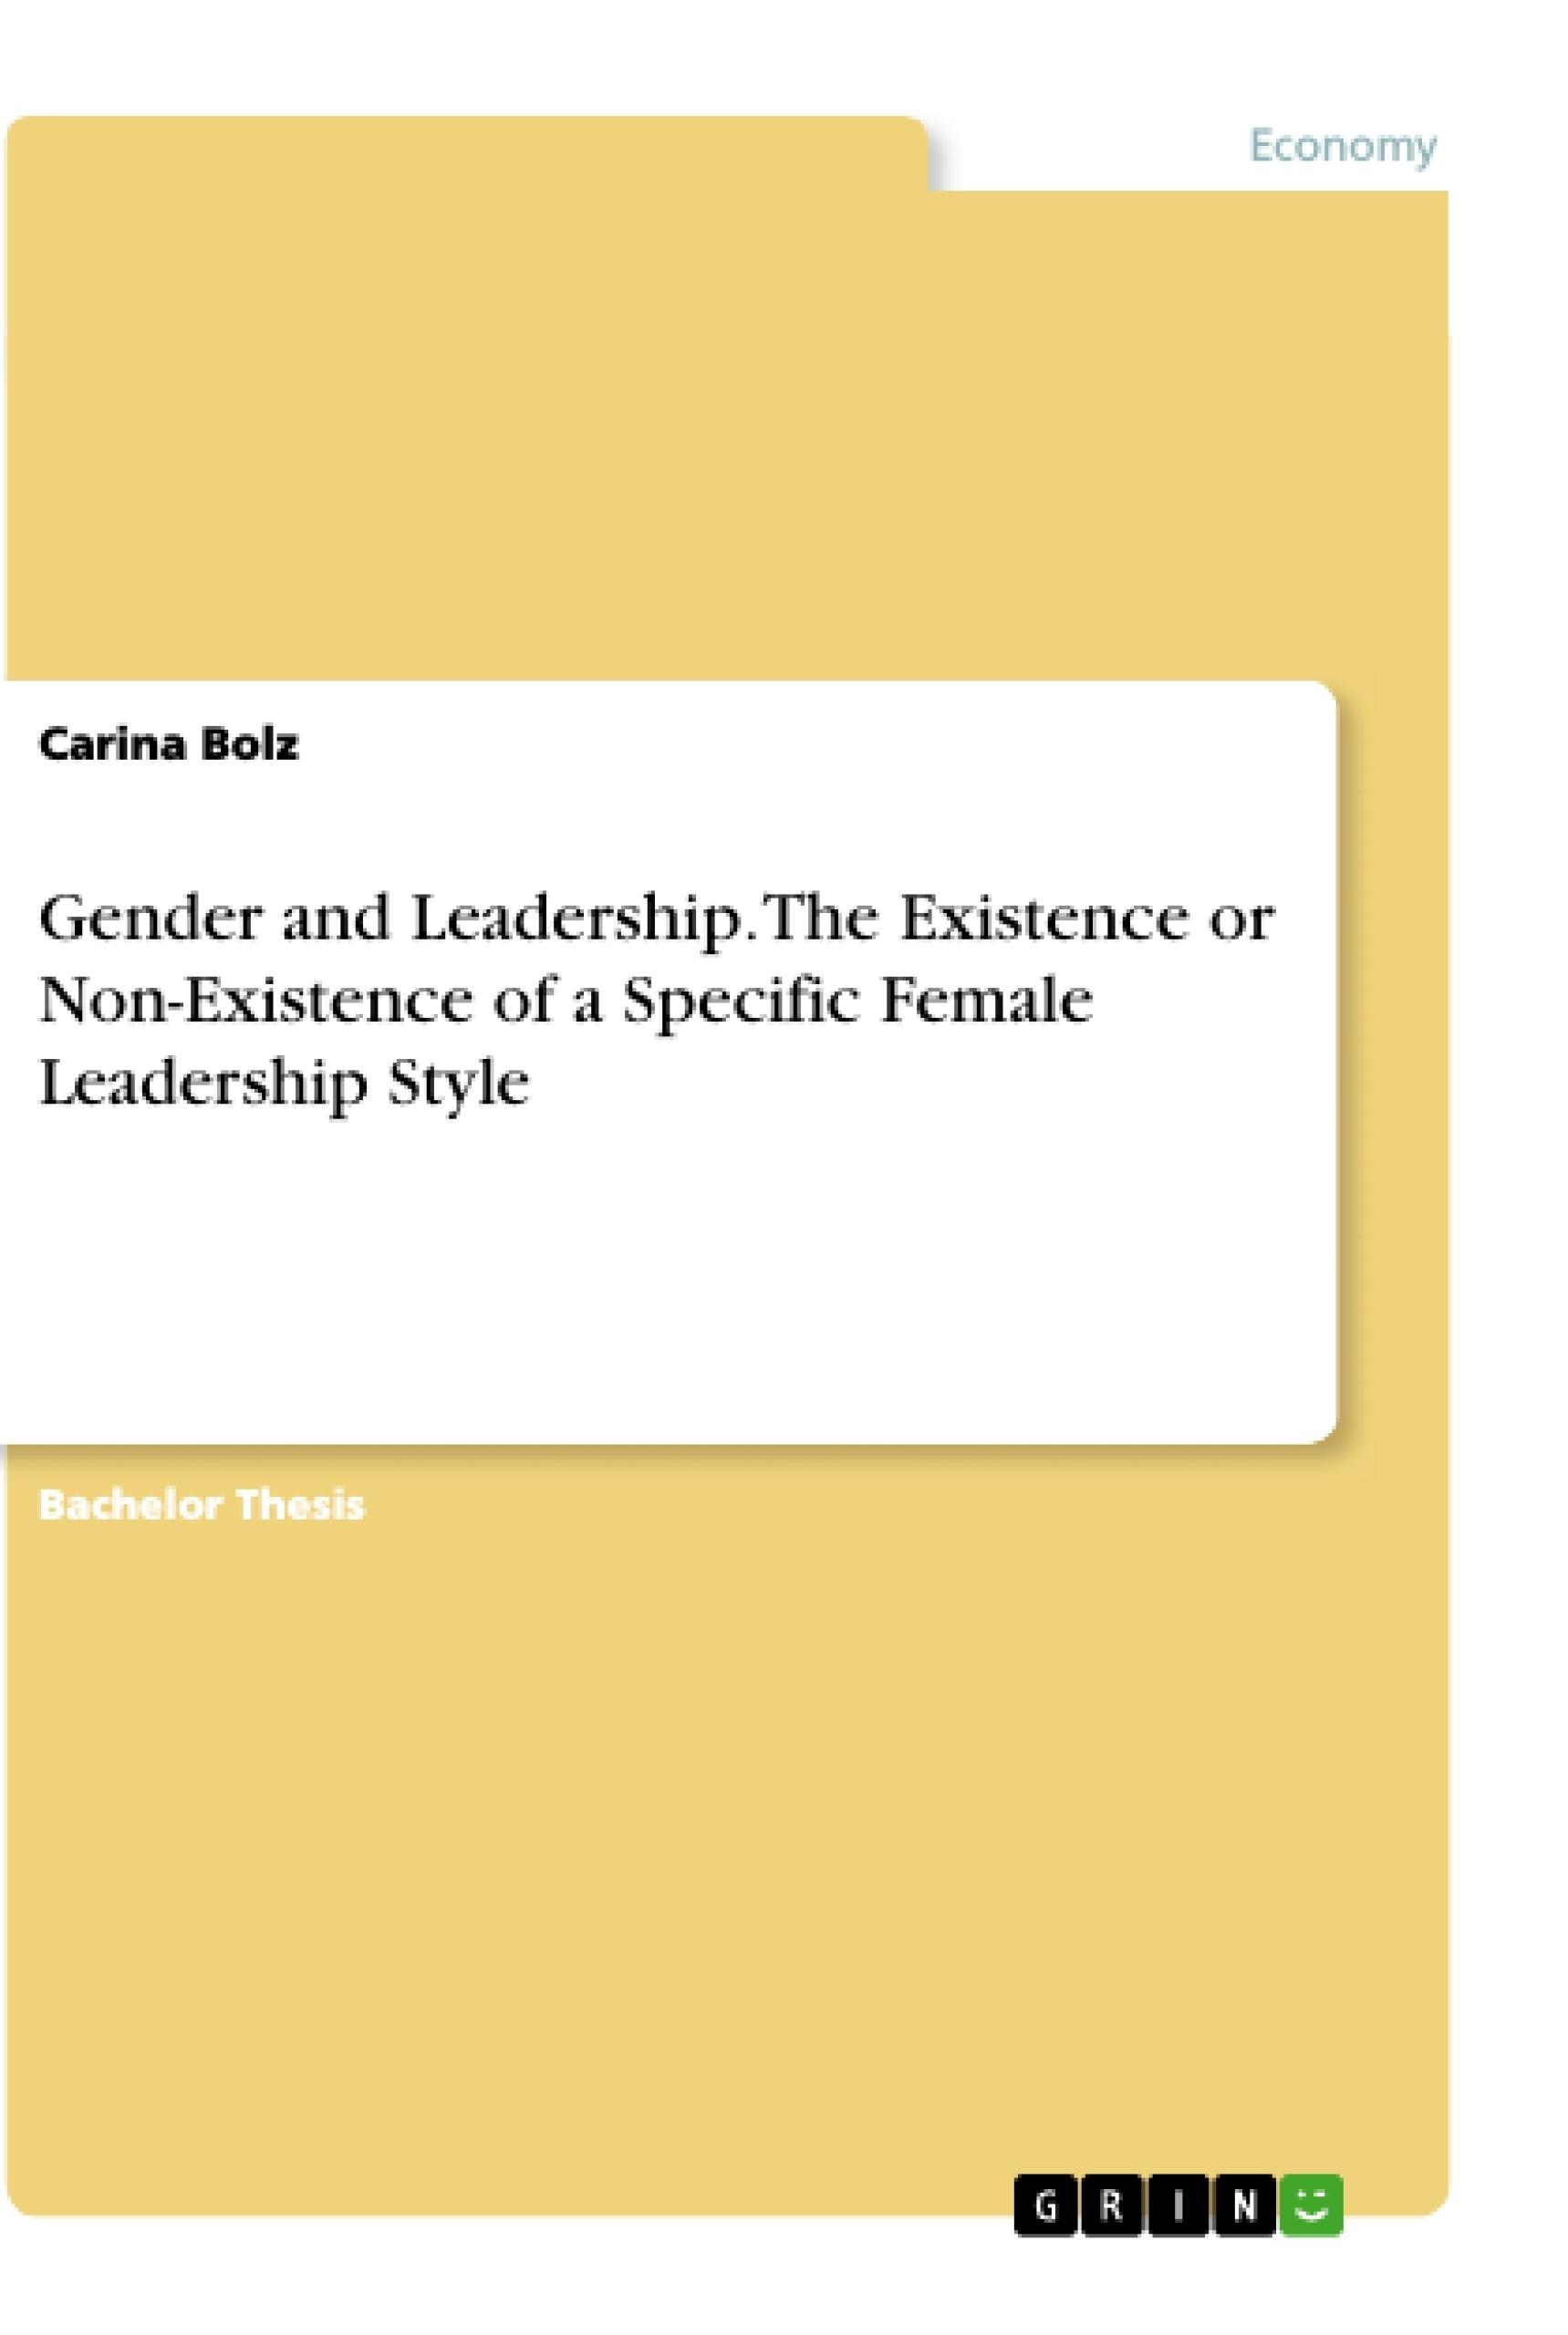 gender and leadership essay